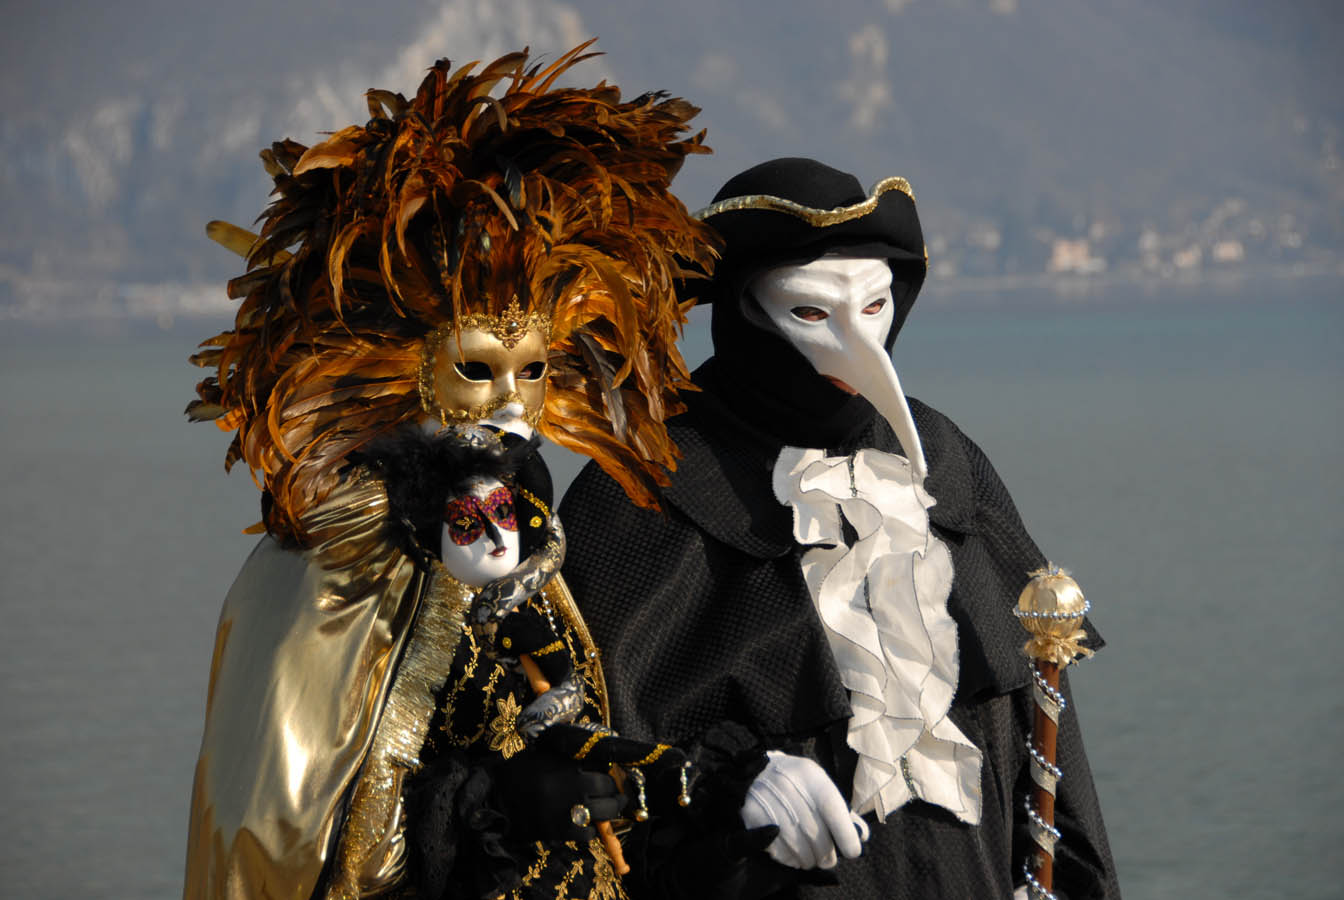 http://4.bp.blogspot.com/-8rVA-C0CClc/TpboGCJ6keI/AAAAAAAAQvQ/5tz5bhG_NSc/s1600/Carnival+images+%252851%2529.jpg